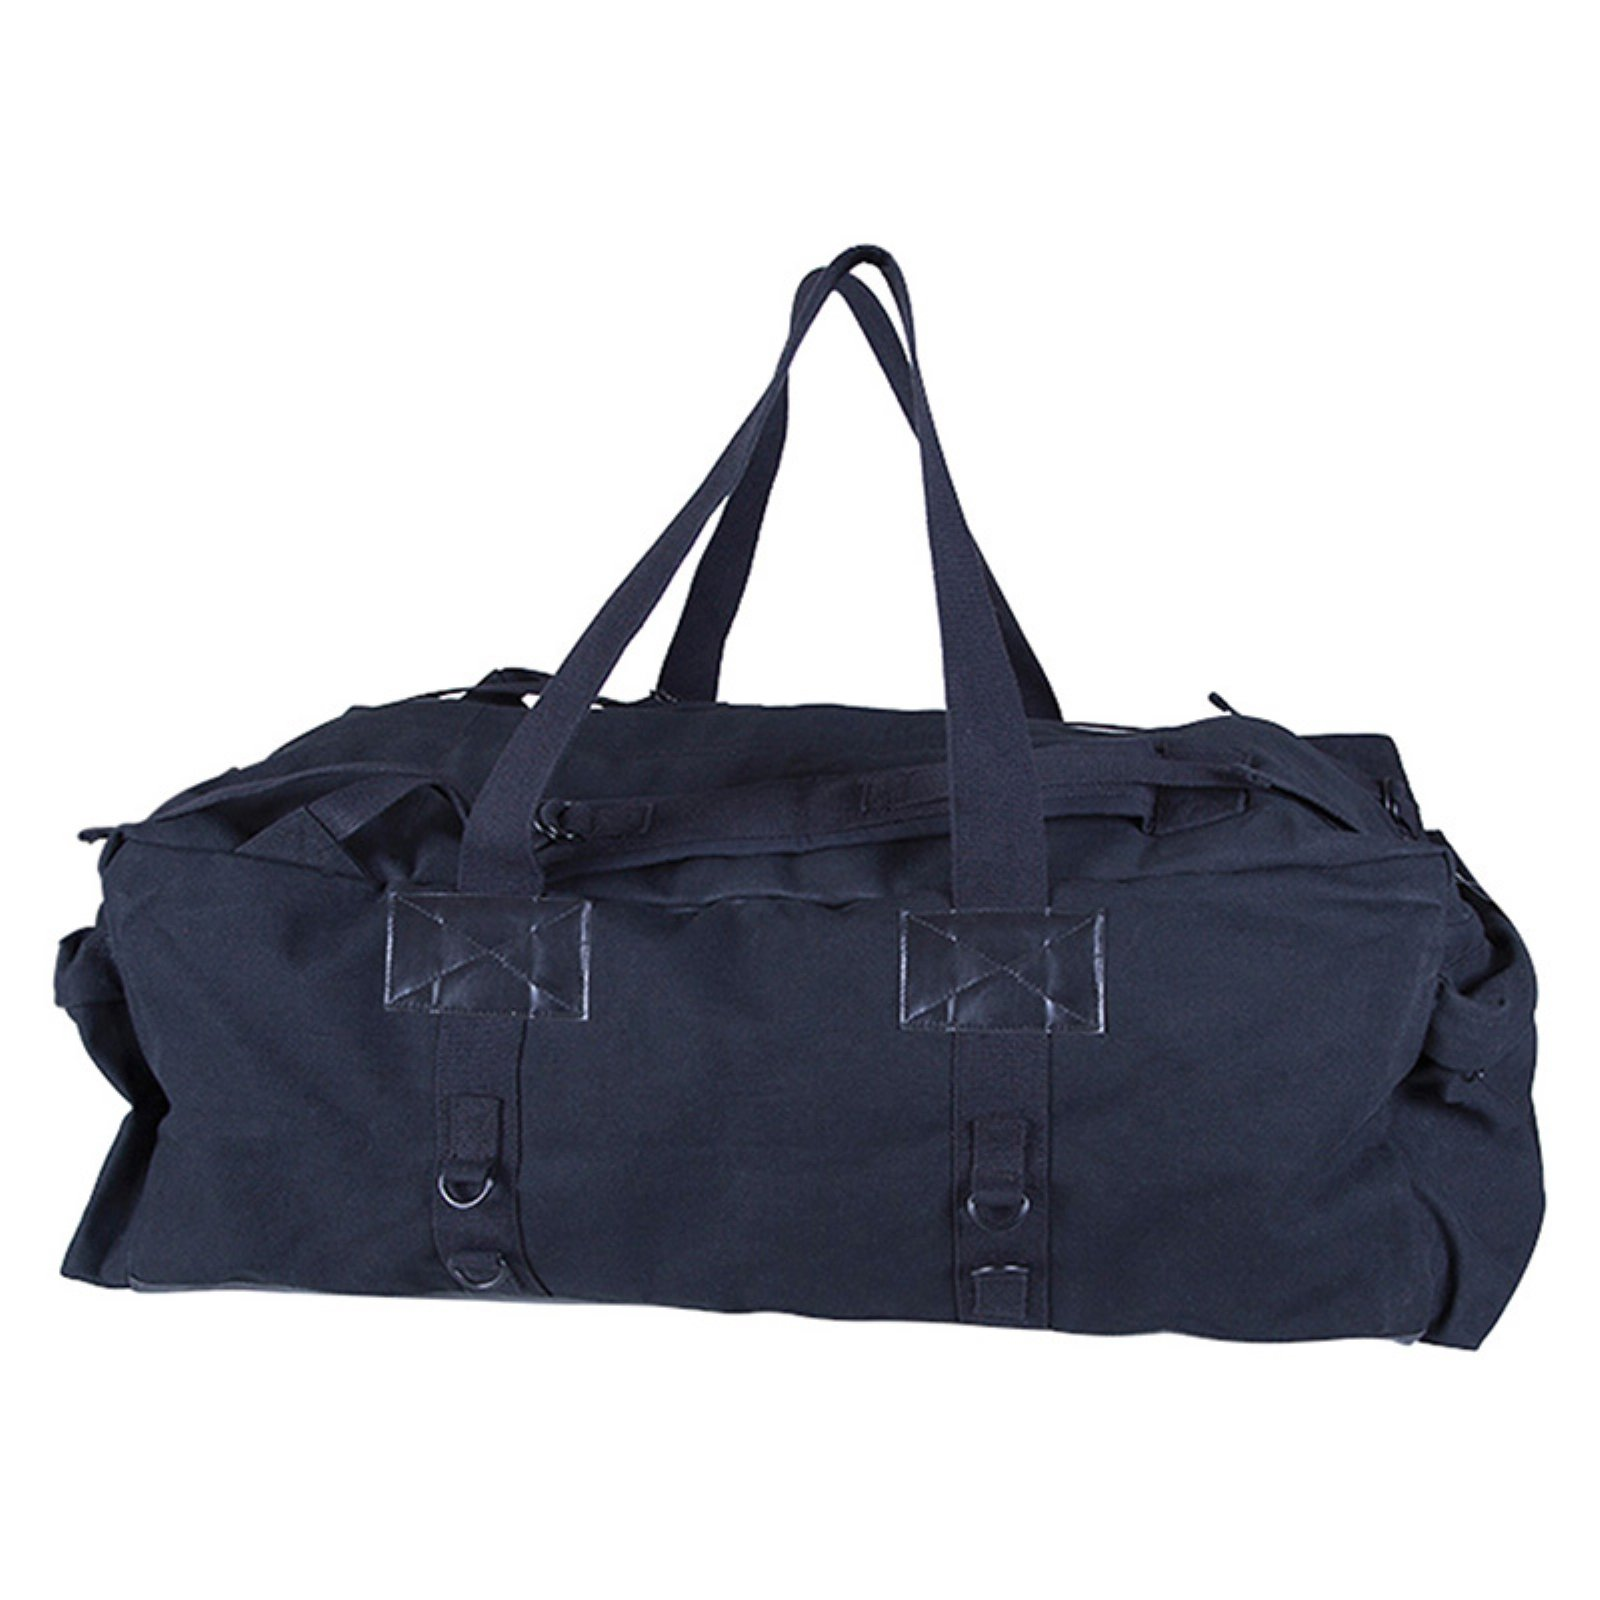 "Canvas Duffle Bag, Black, 34"" x 15"" X by Generic"